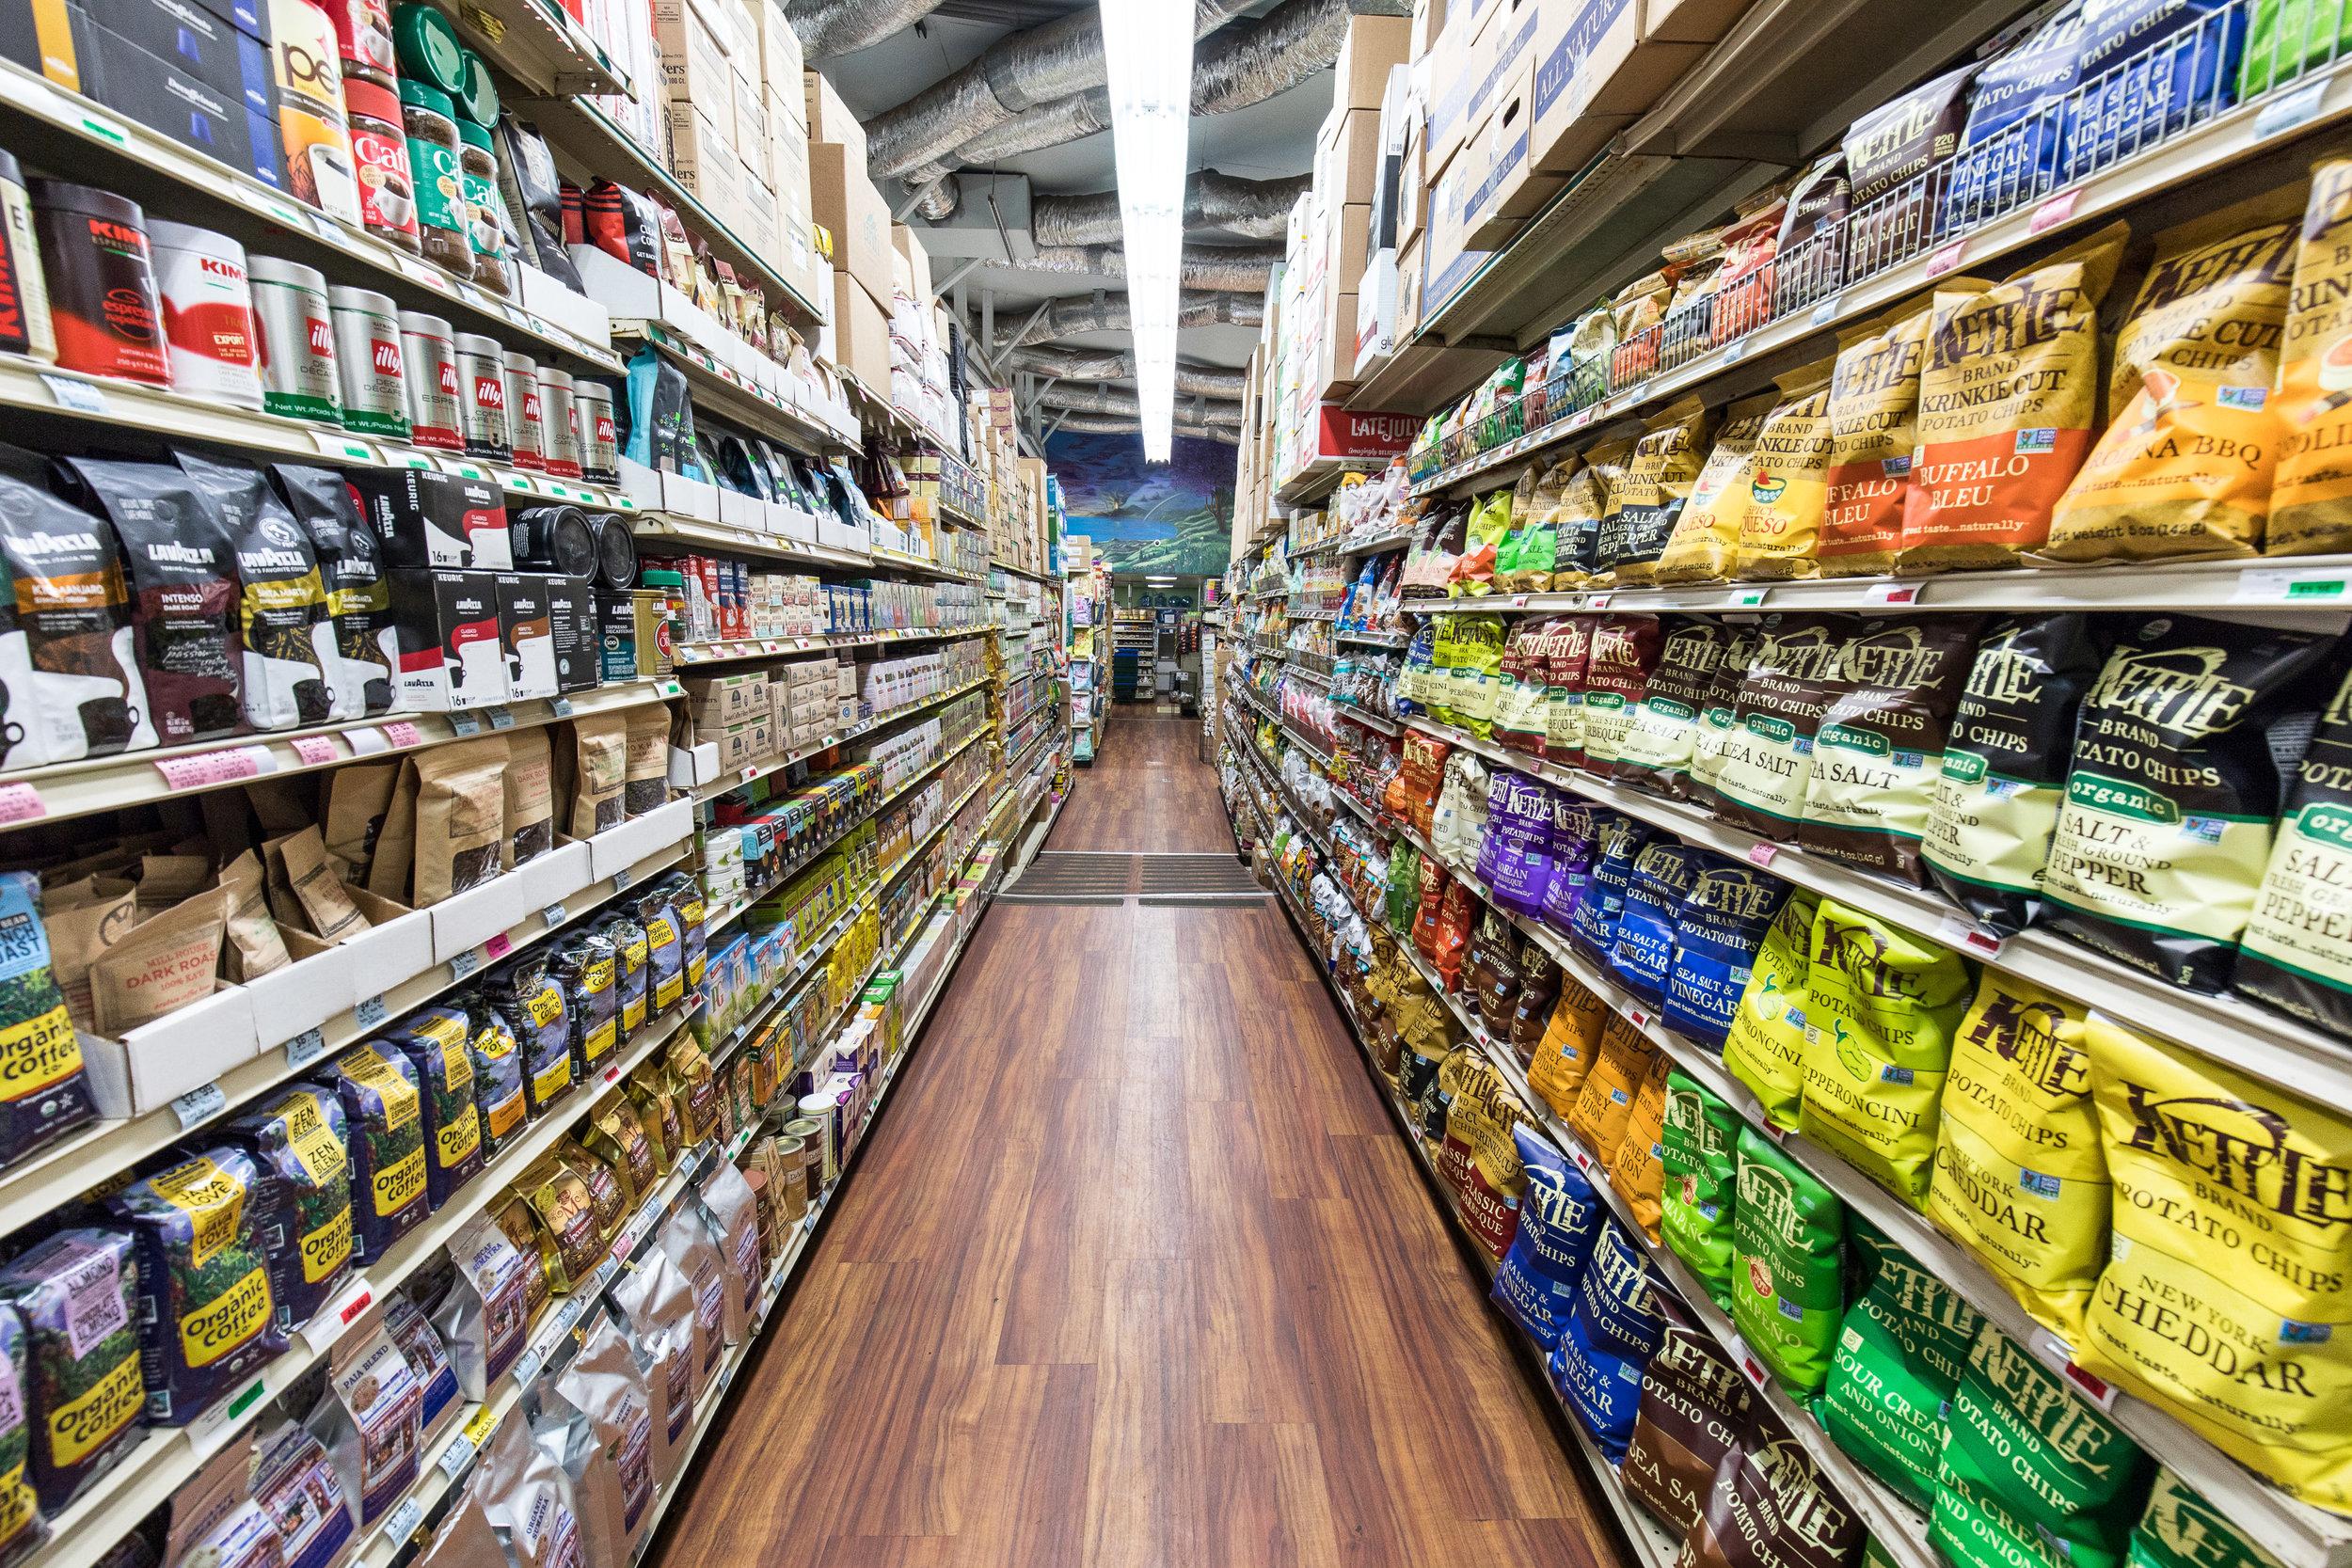 mana-foods-quality-grocery-store-aisle copy.jpg